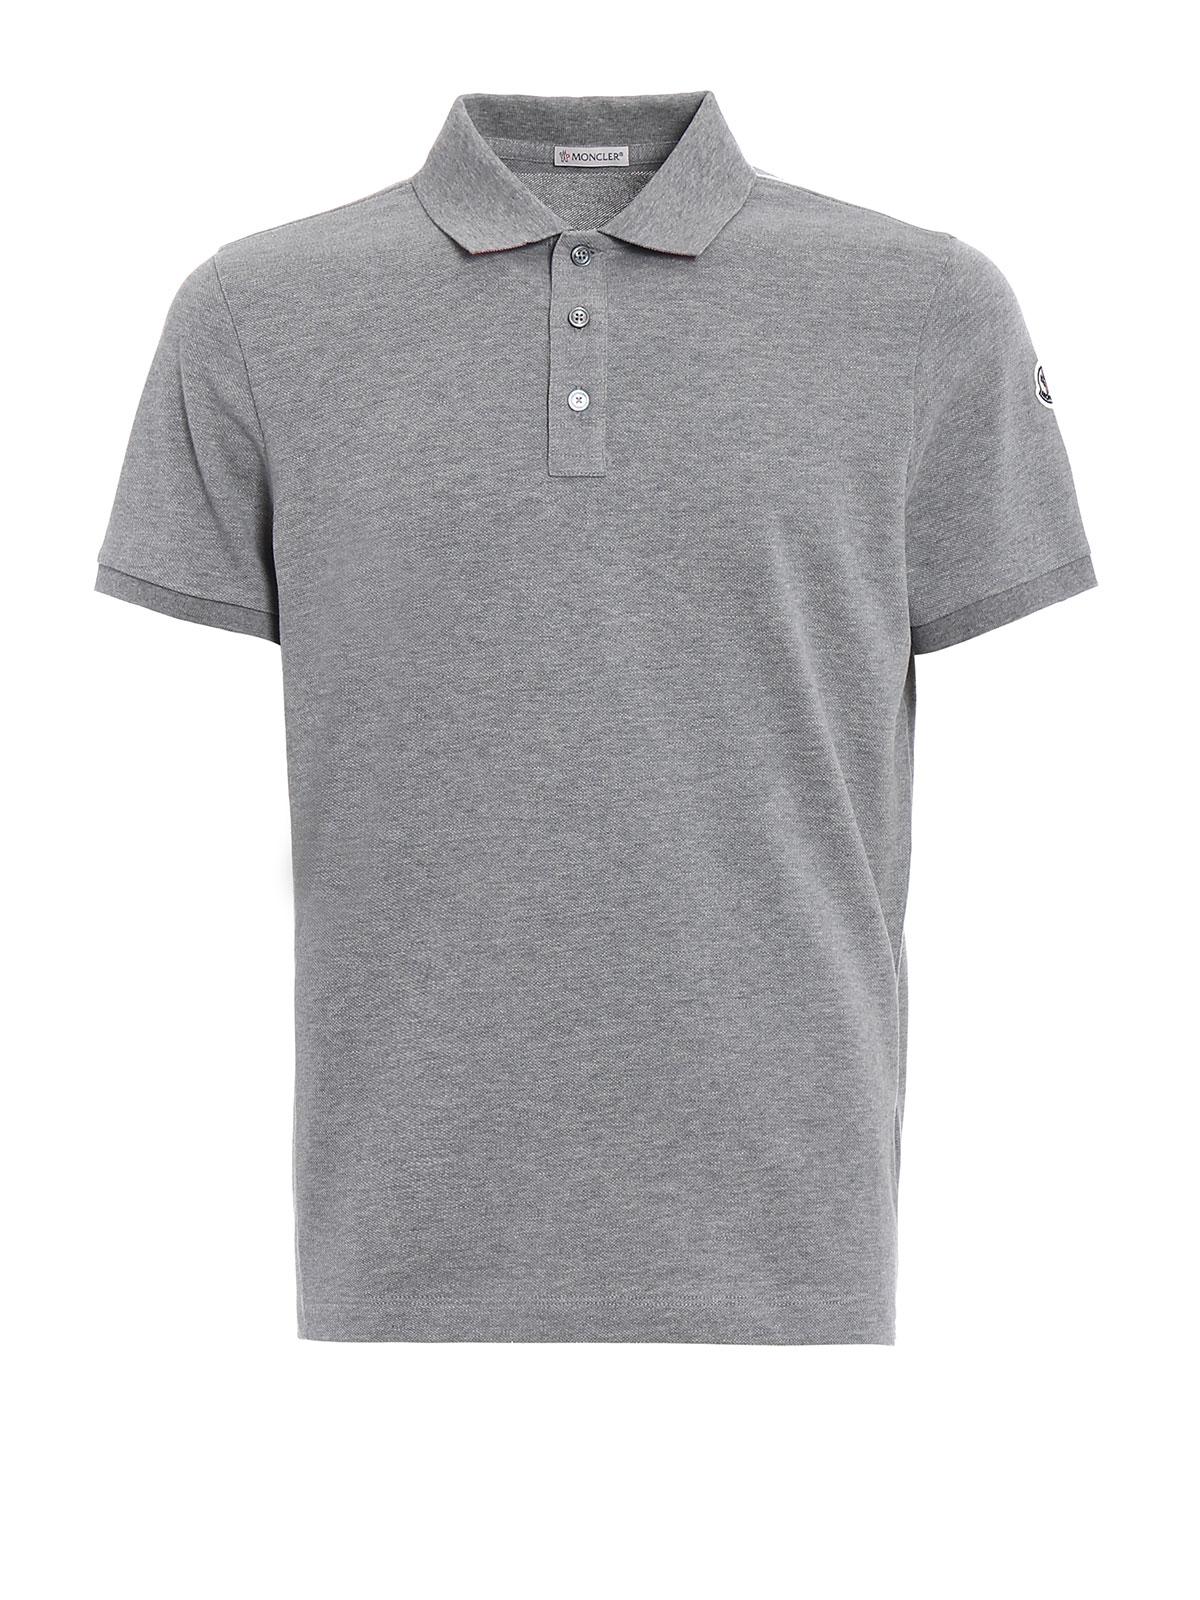 MONCLER: polo shirts - Solid grey polo shirt